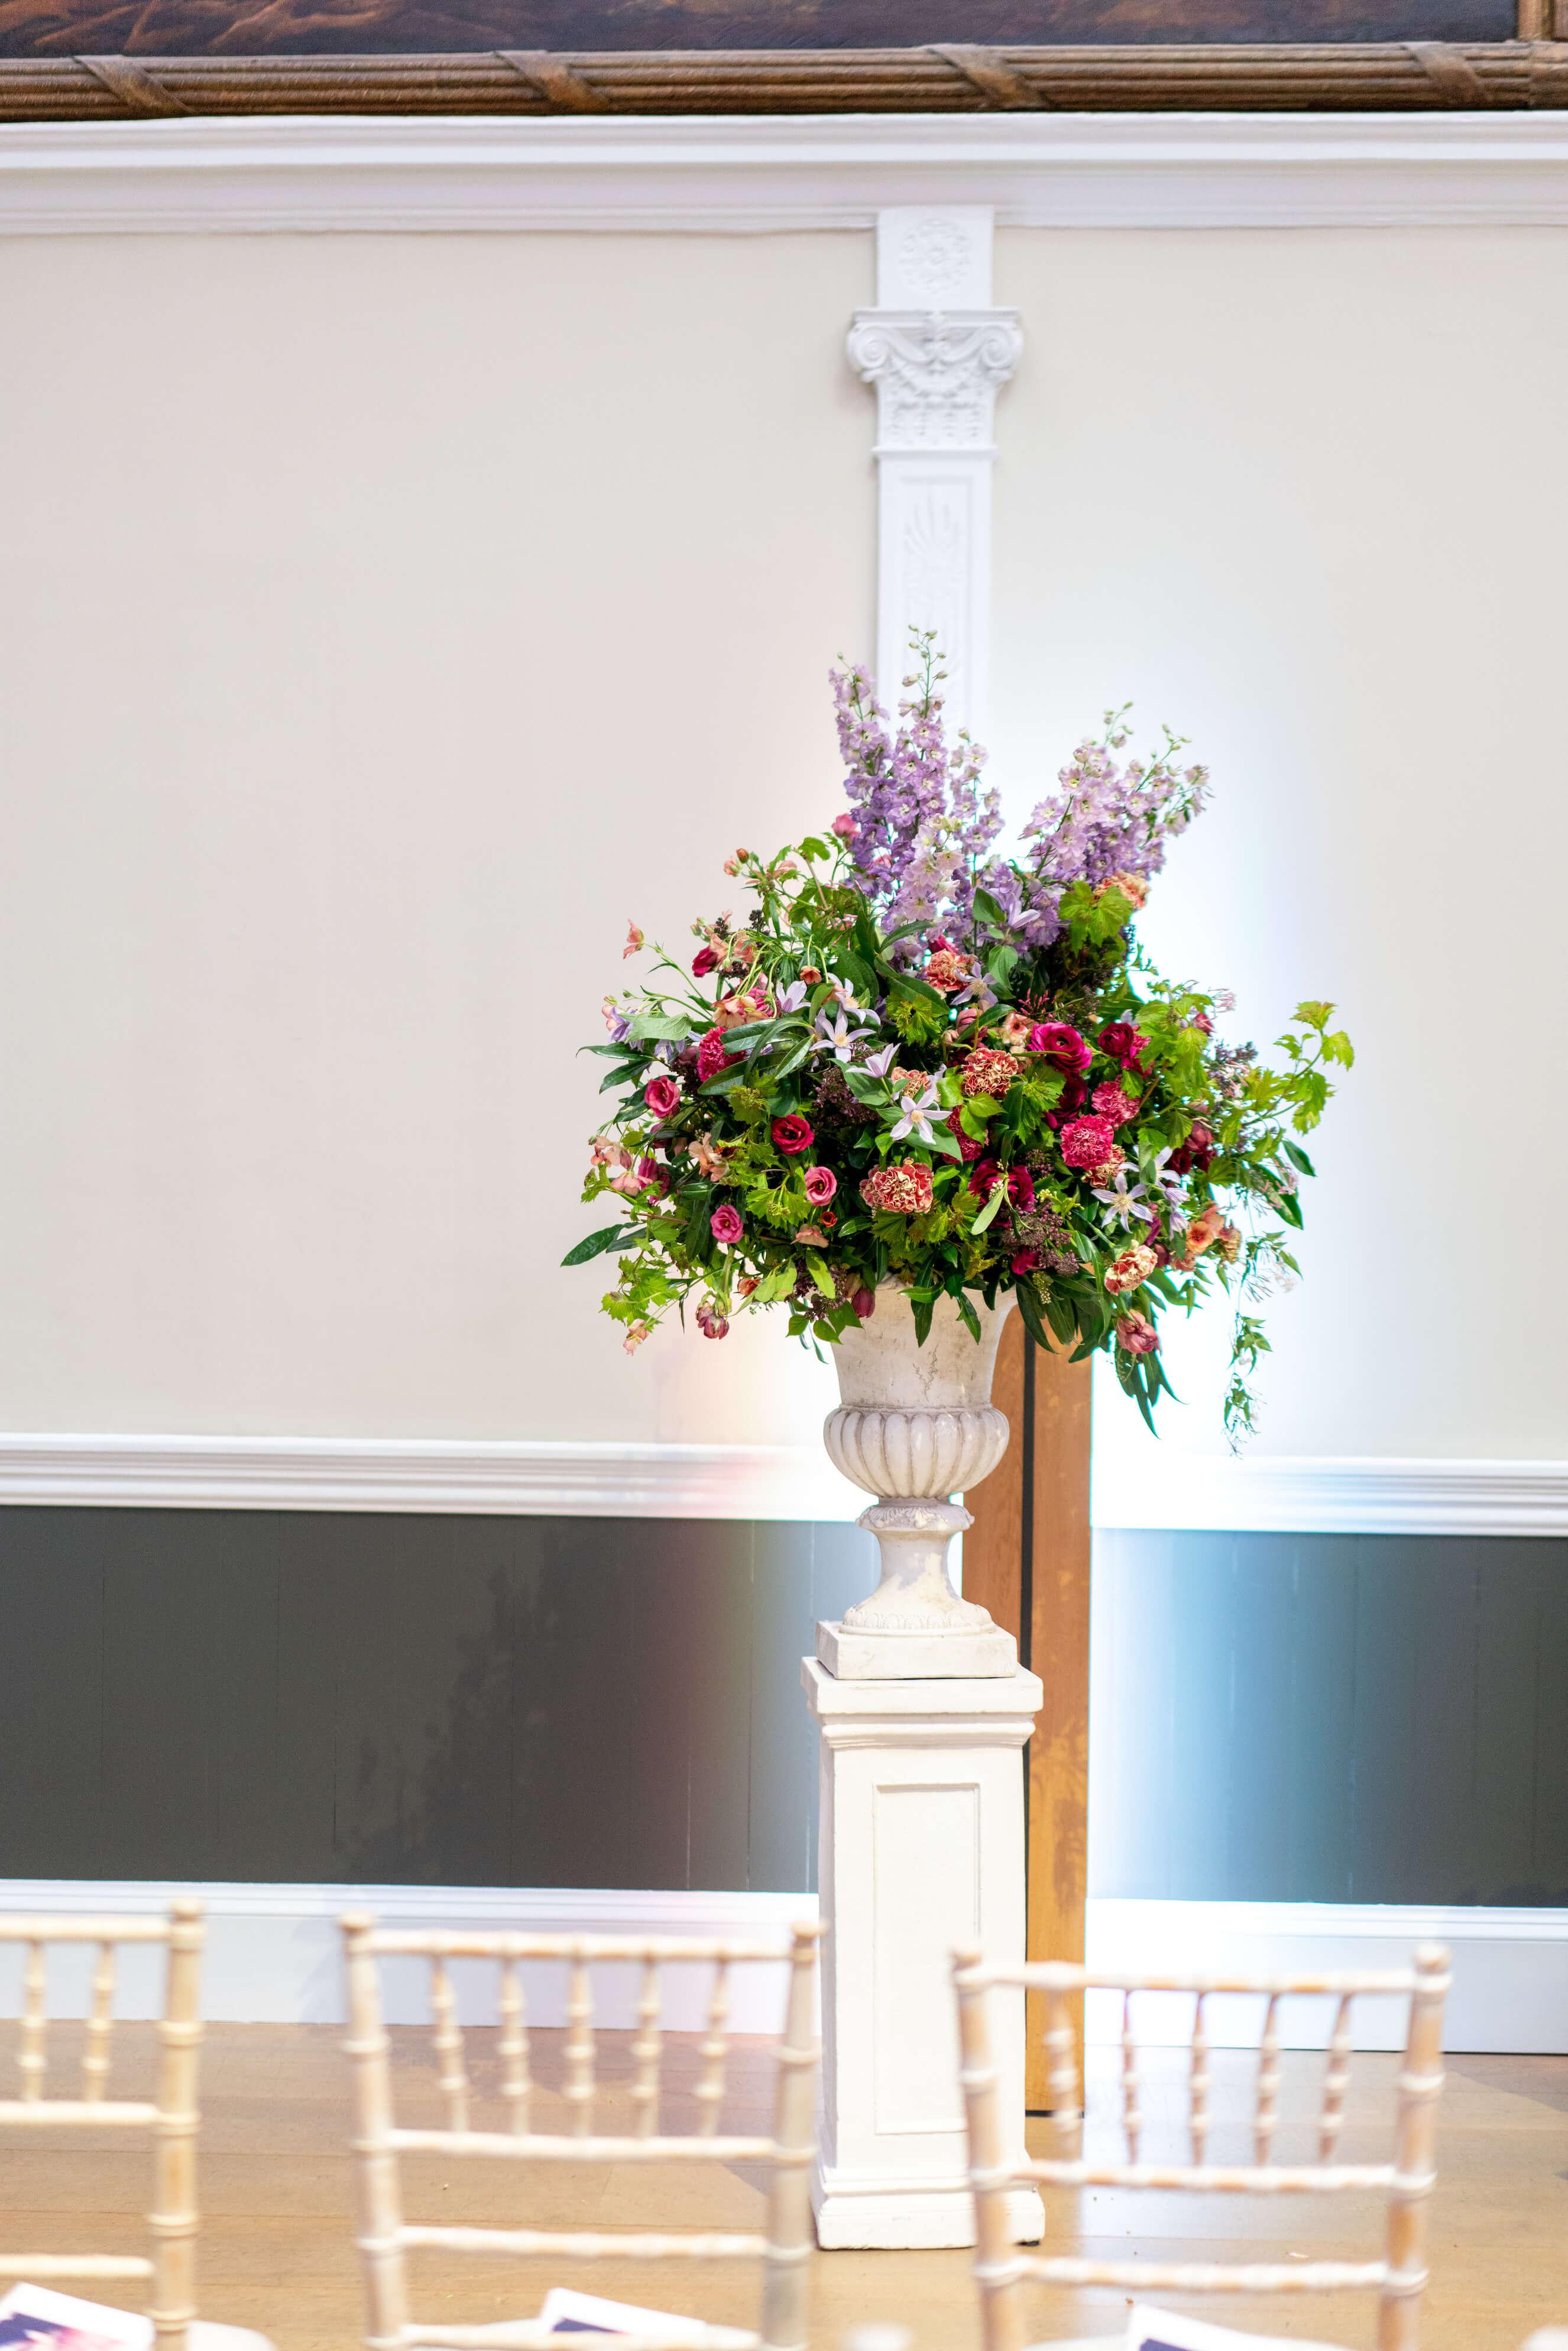 Tall ceremony aisle flower centrepiece arrangement